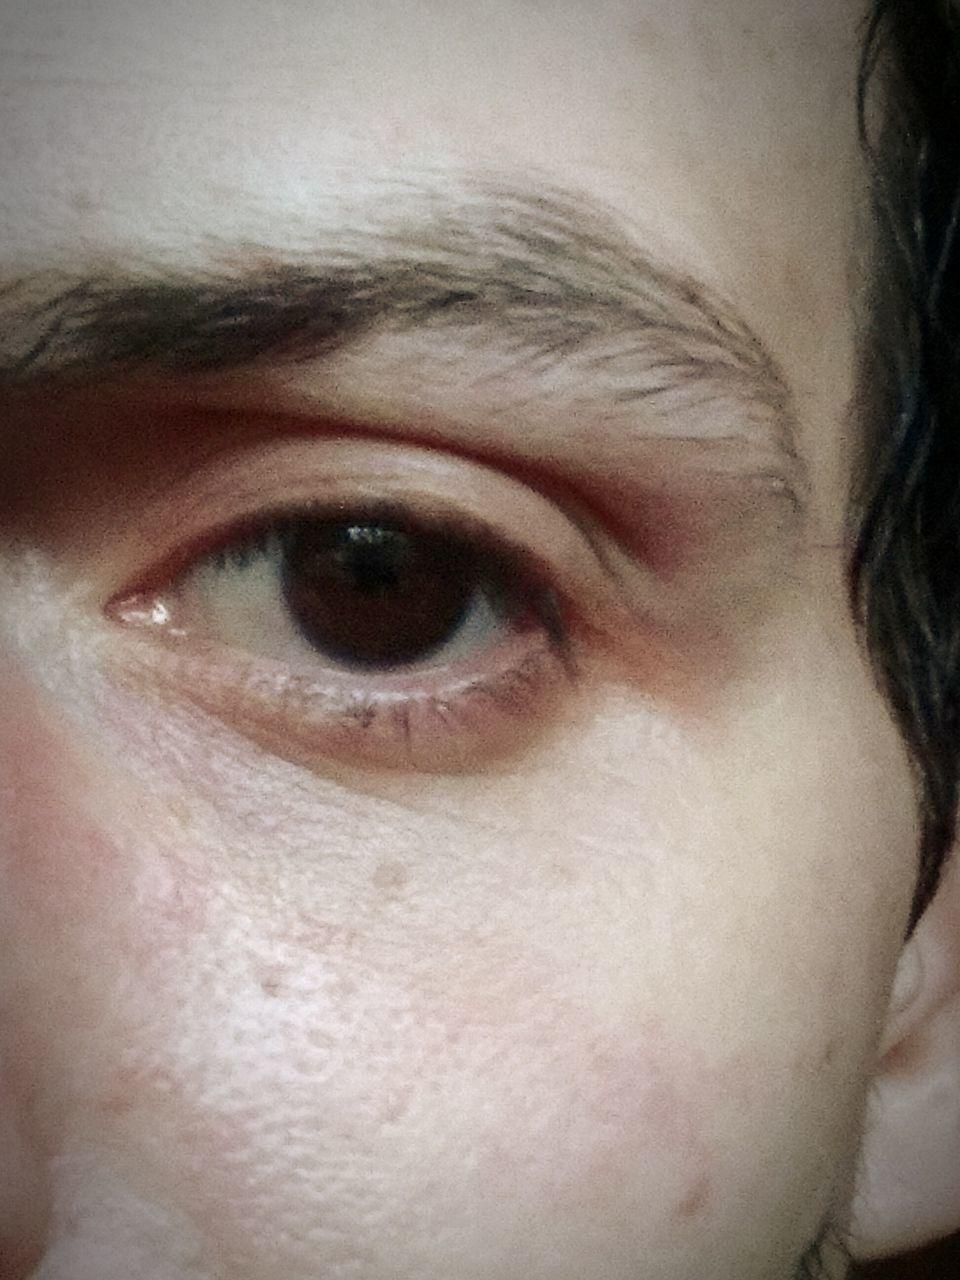 human eye, one person, close-up, real people, eyebrow, human body part, human face, indoors, men, eyelid, eyesight, eyeball, looking at camera, portrait, eyelash, iris - eye, one man only, day, adult, people